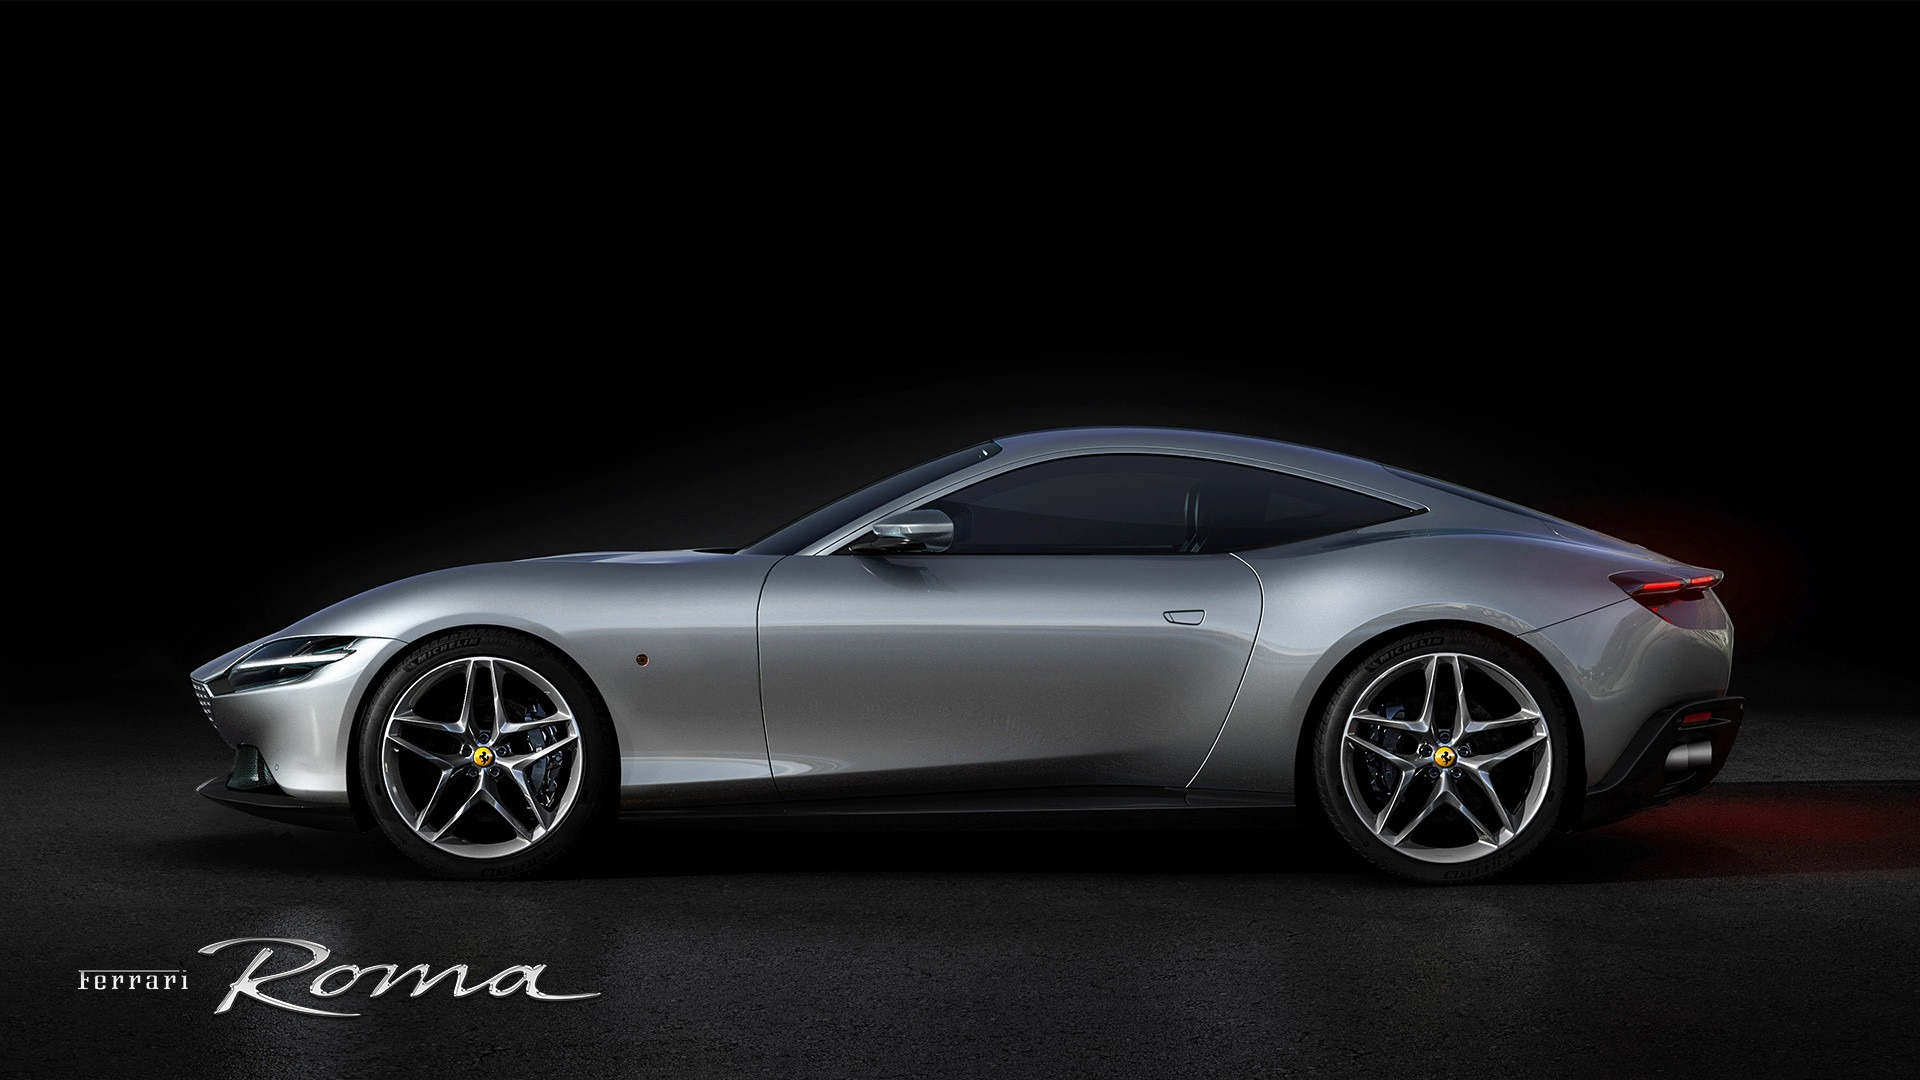 New-2020-Ferrari-Roma